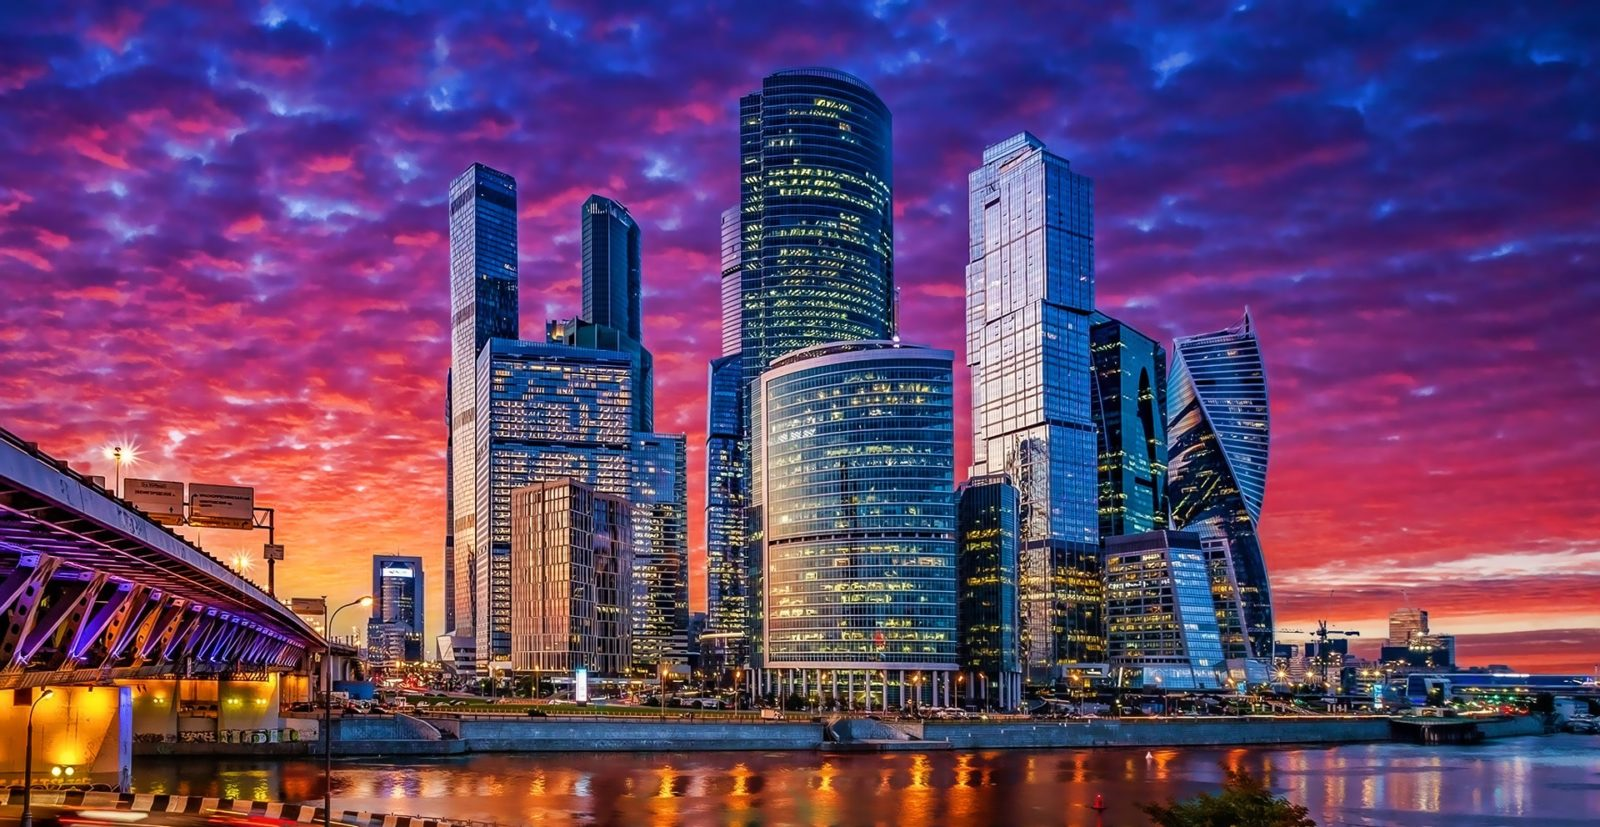 Небоскрёбы Москва-Сити